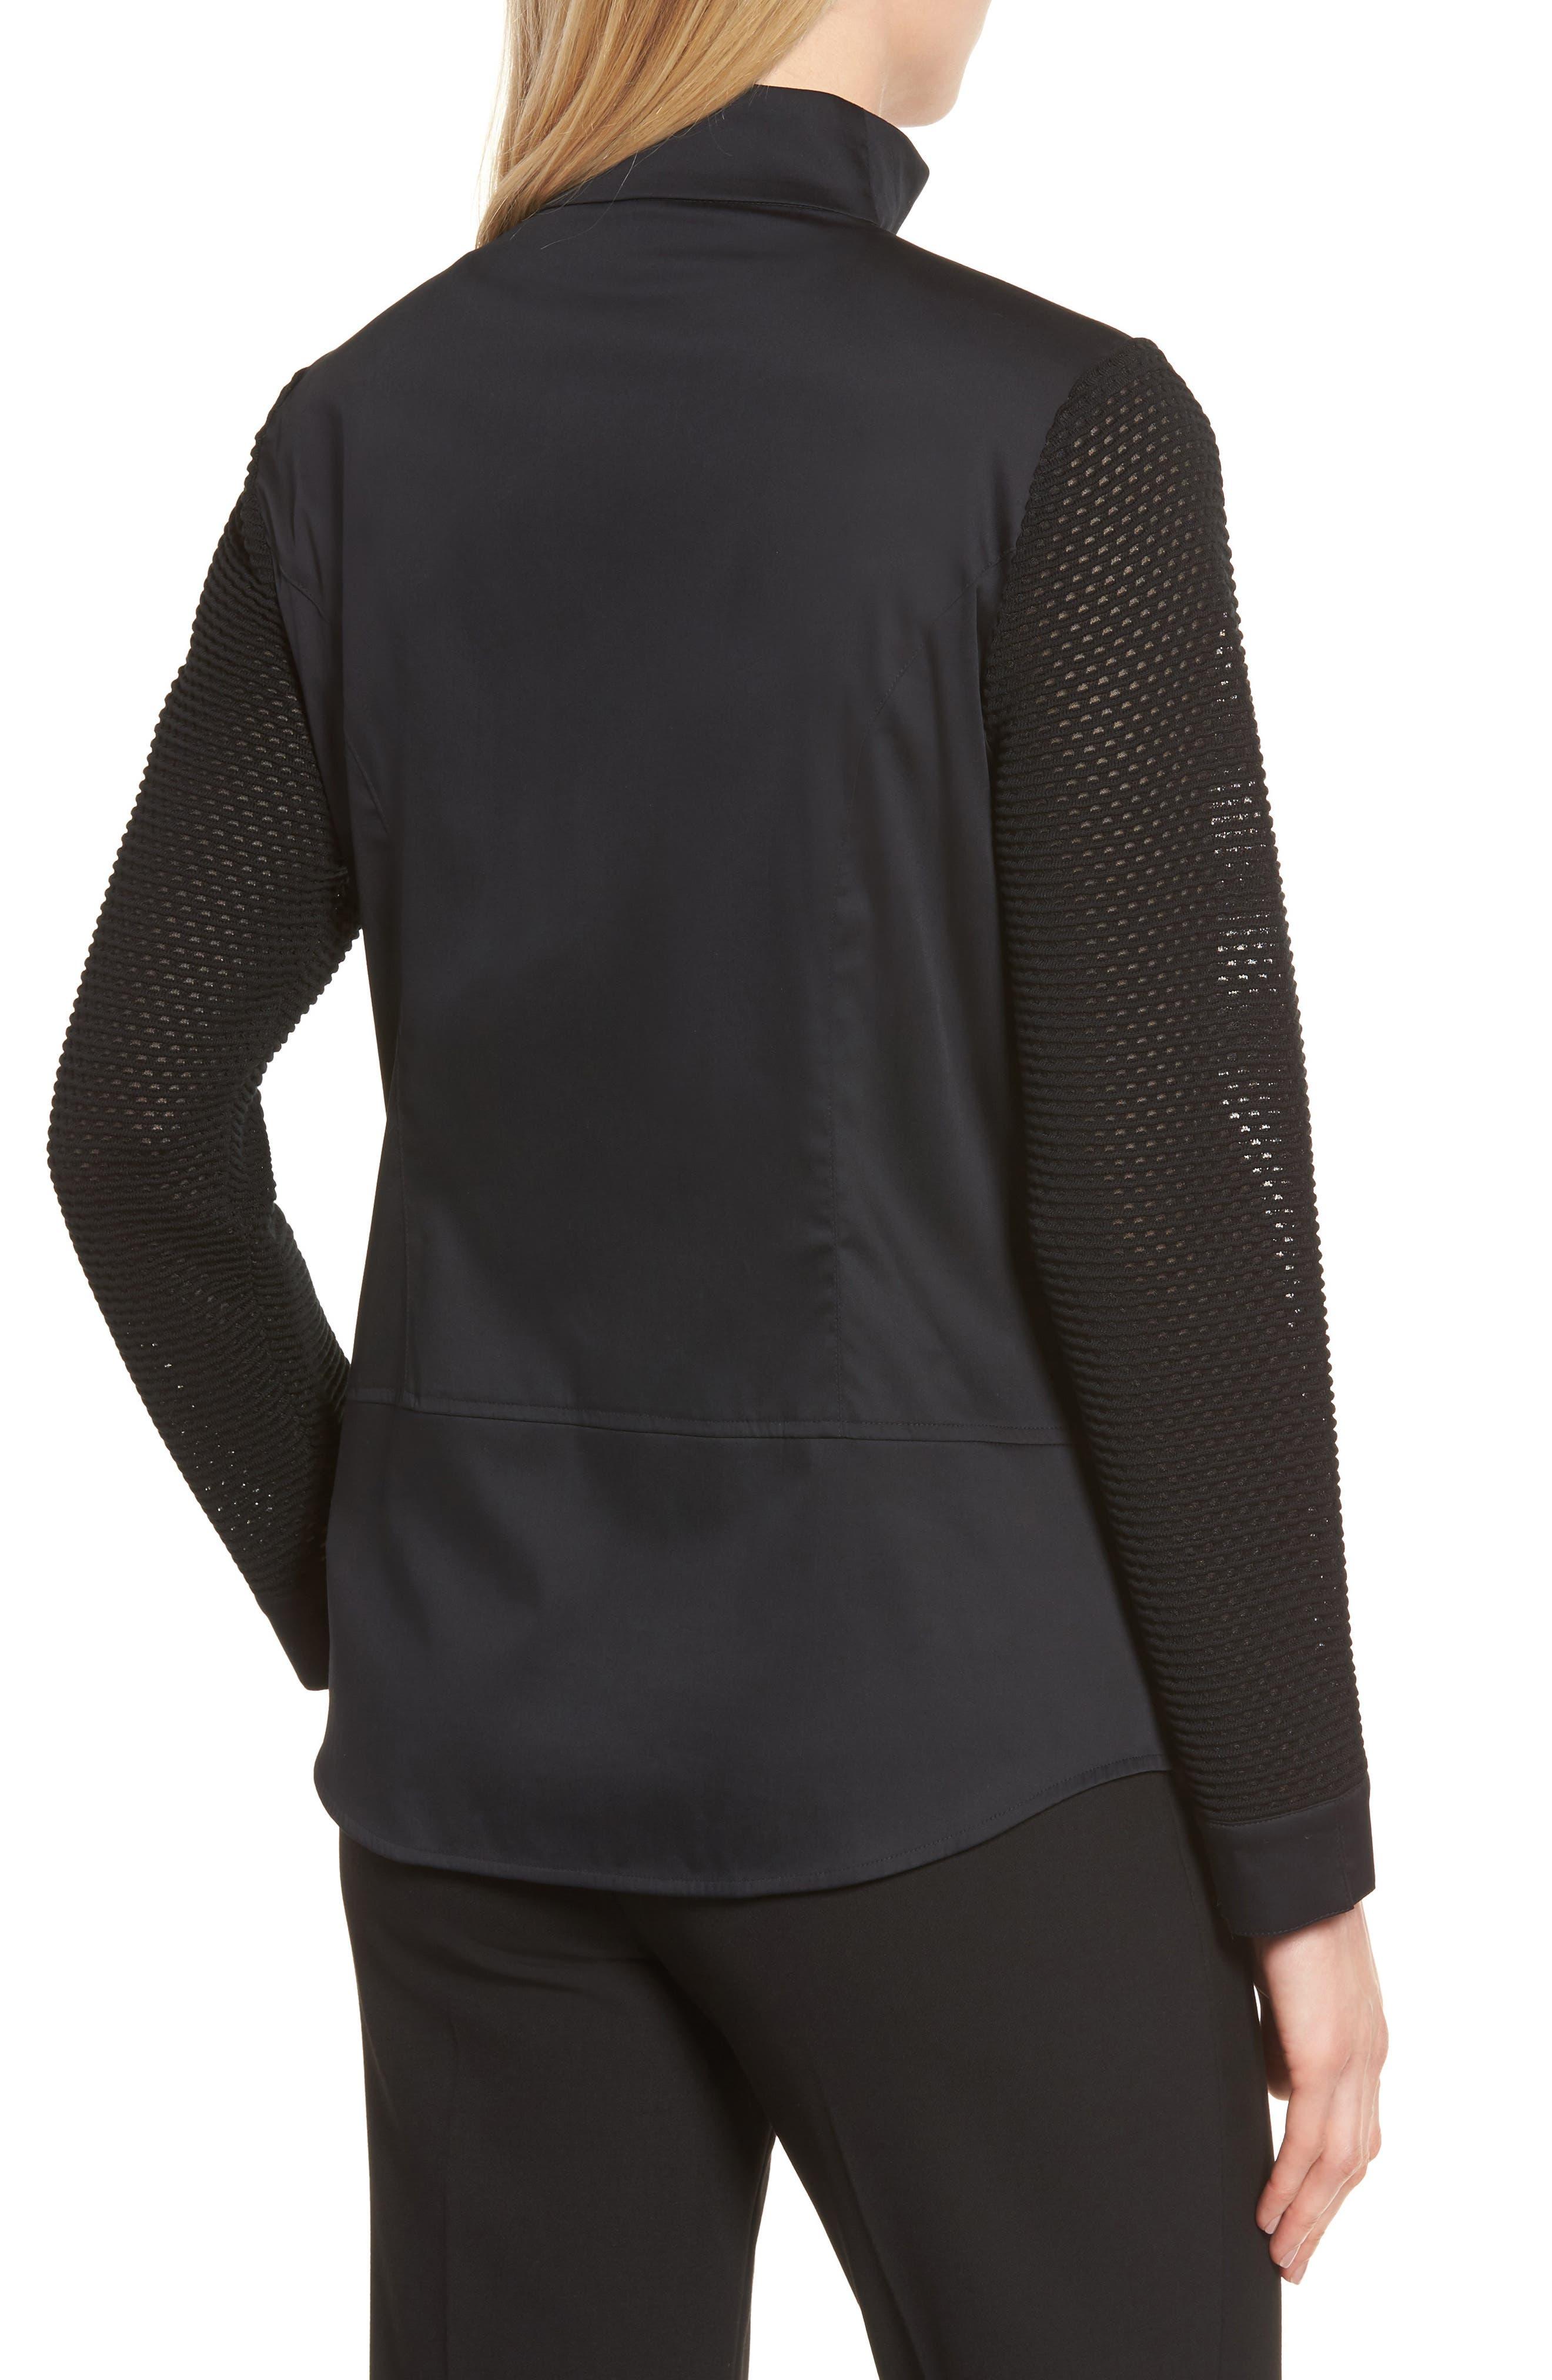 Woven & Knit Jacket,                             Alternate thumbnail 2, color,                             Black